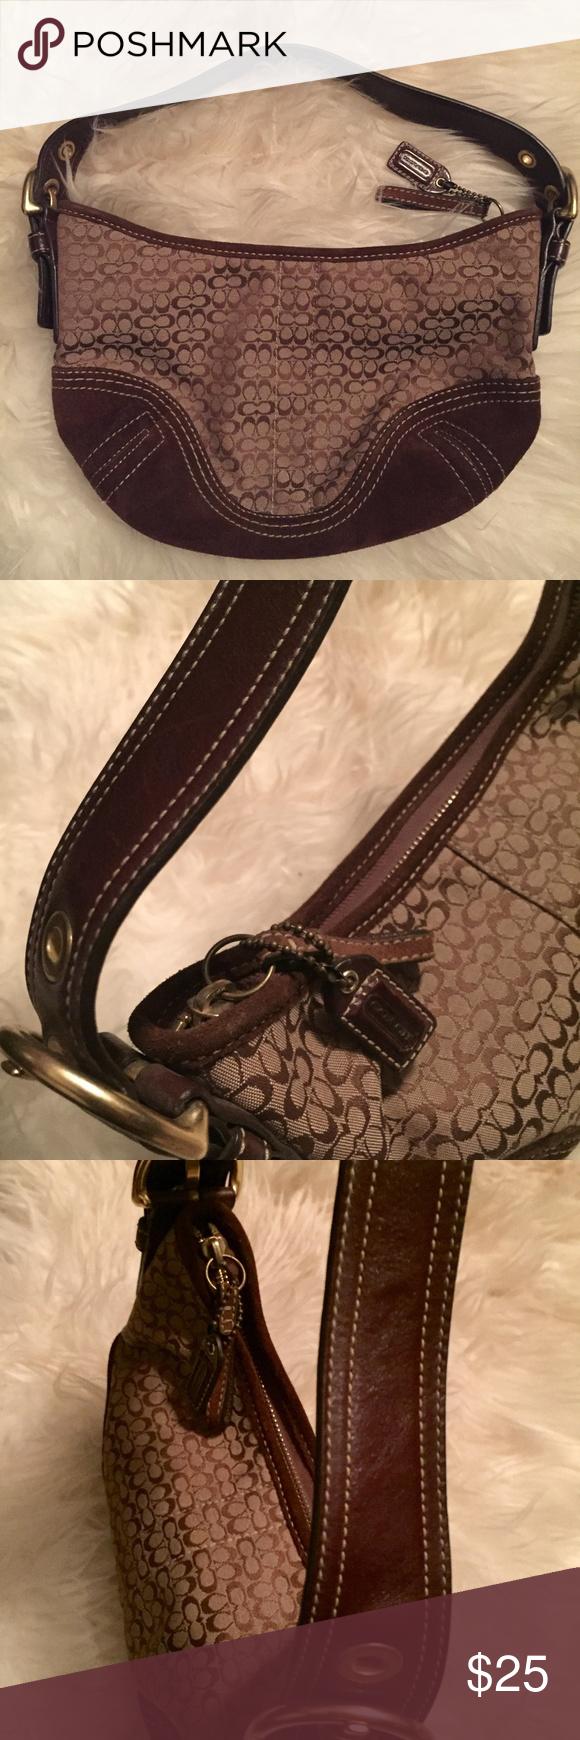 02e66cee2c2d Authentic Coach Handbag Authentic Coach Handbag. Brown and gold CC logo  canvas under the arm